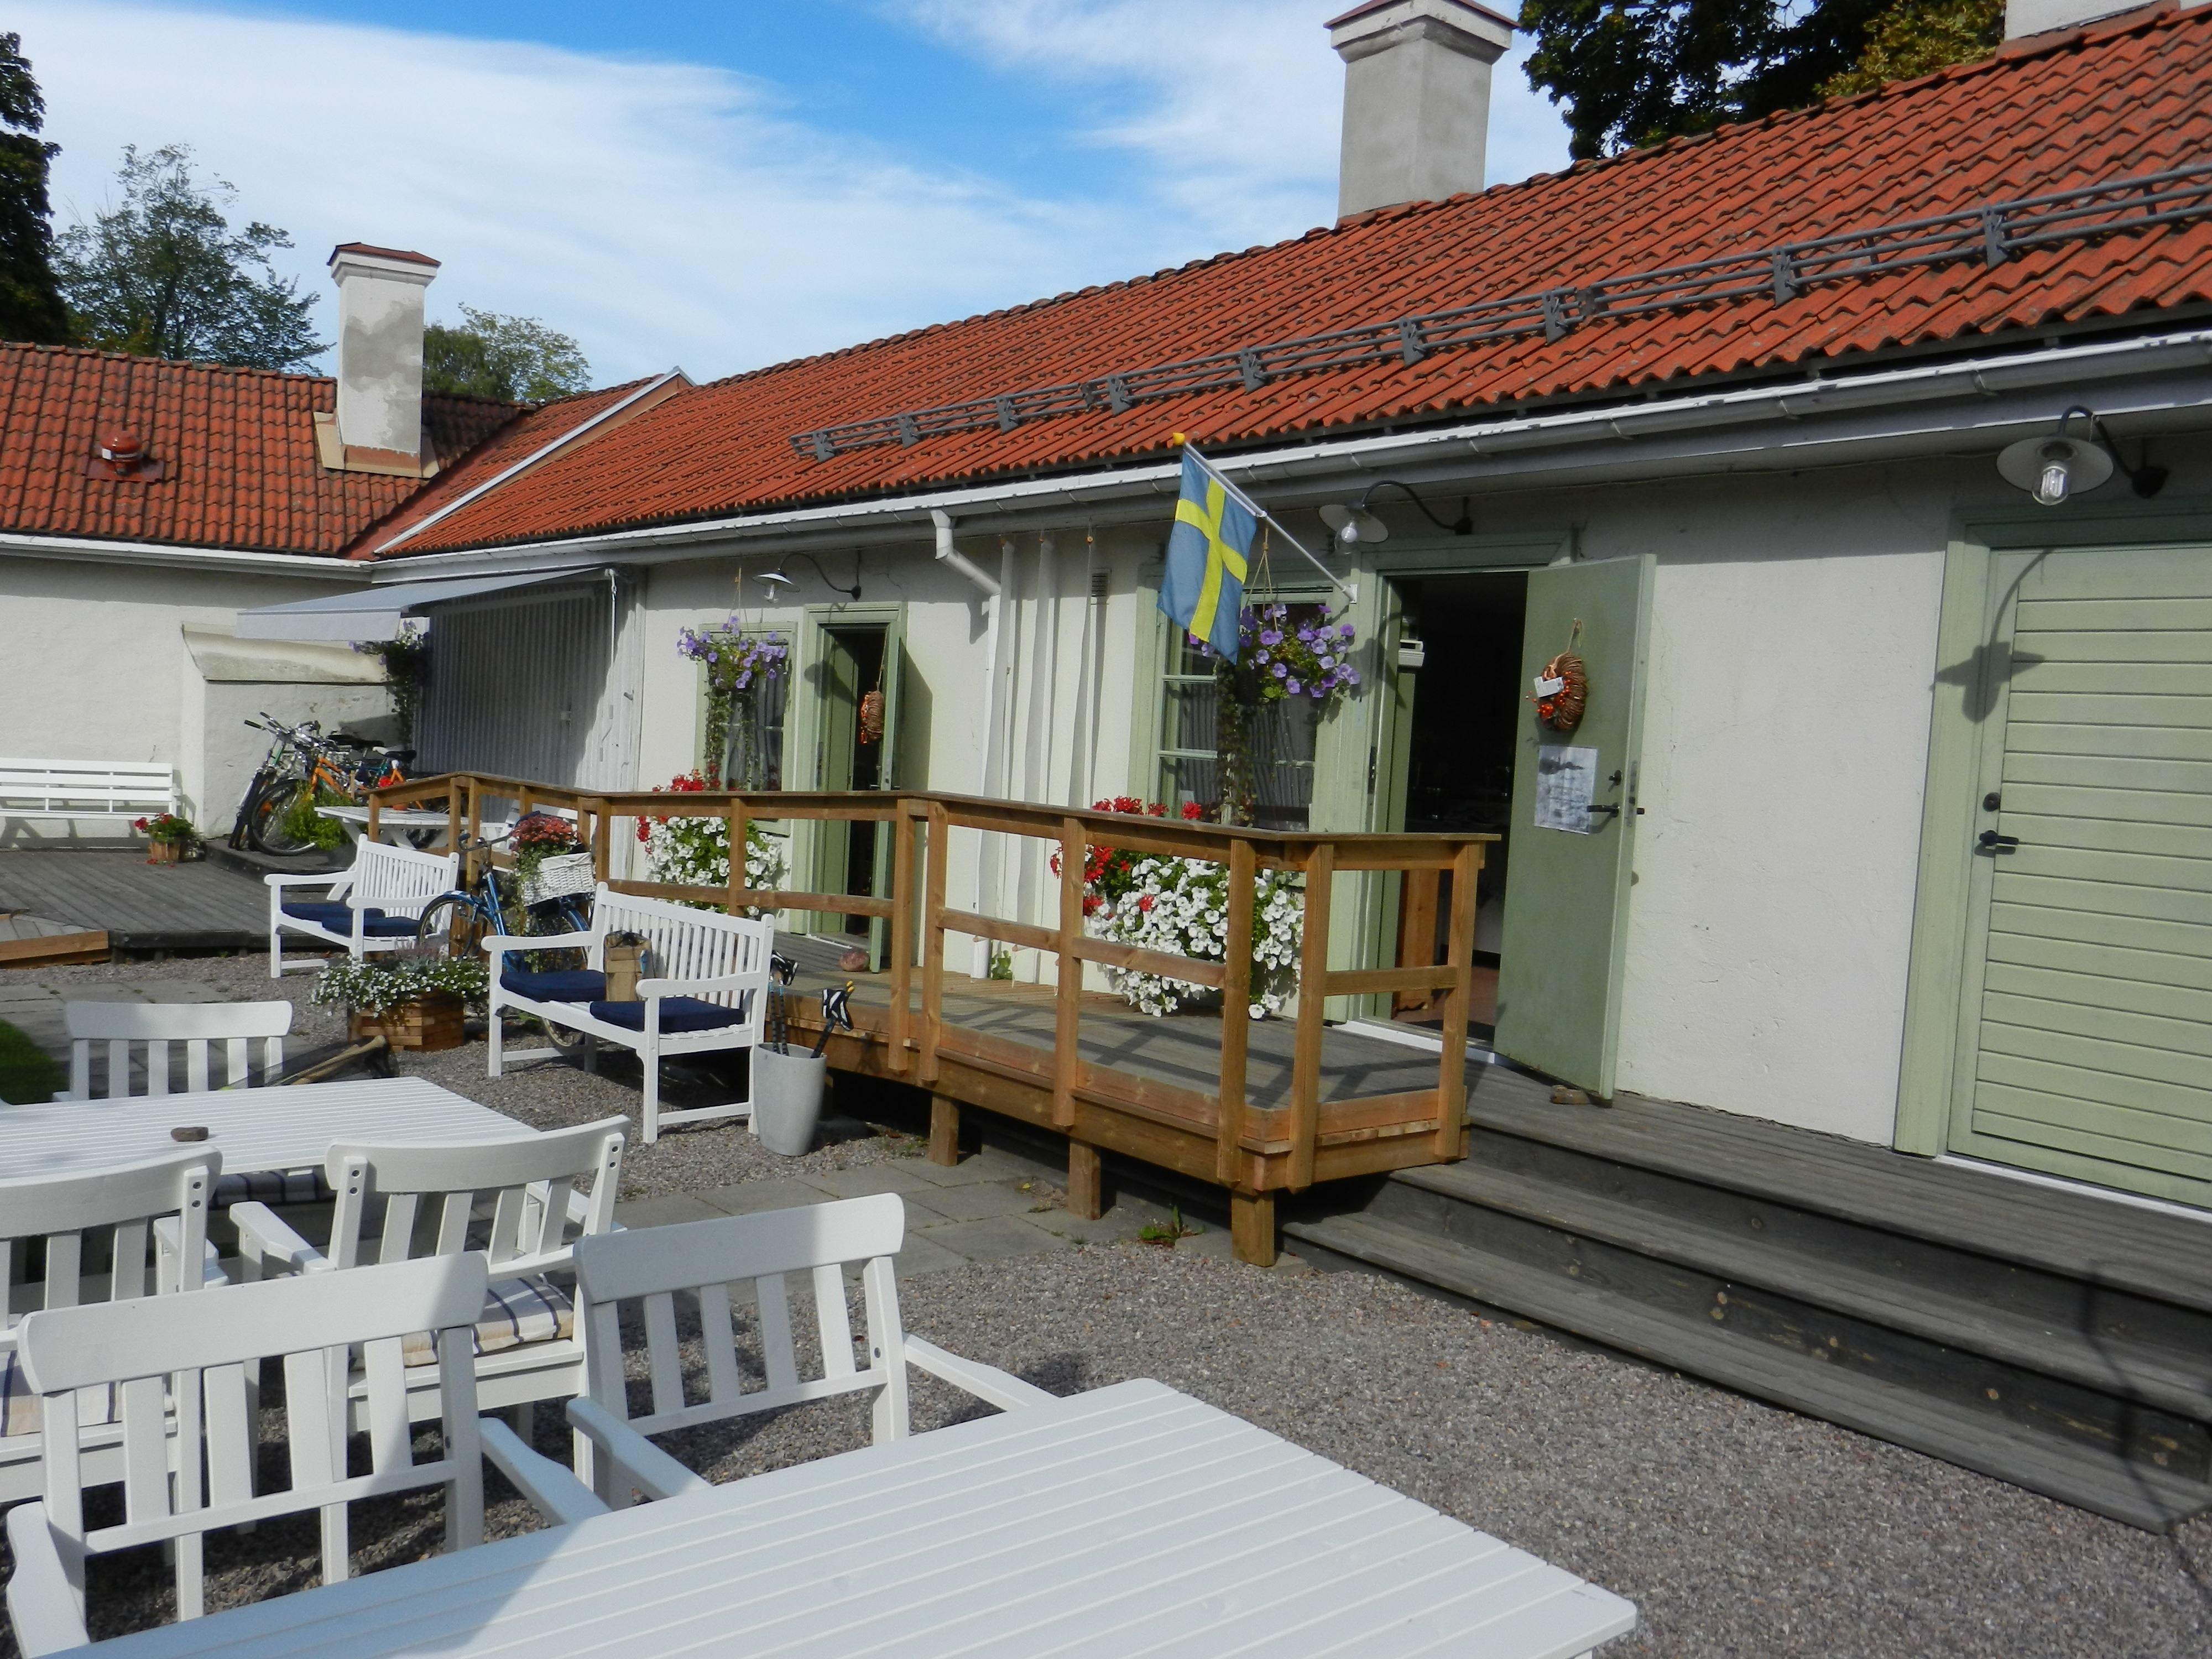 Carl Jularbo Museum & café